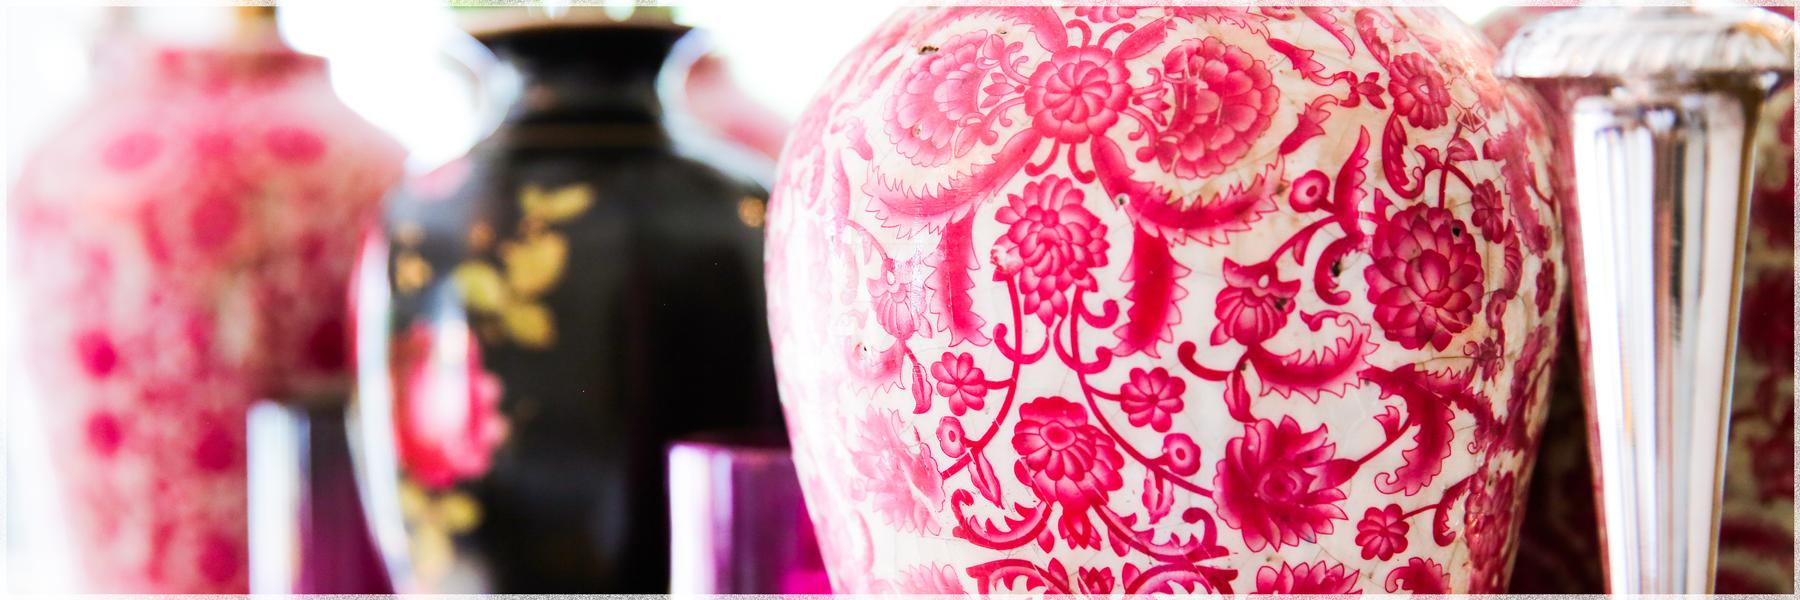 long-vases.png